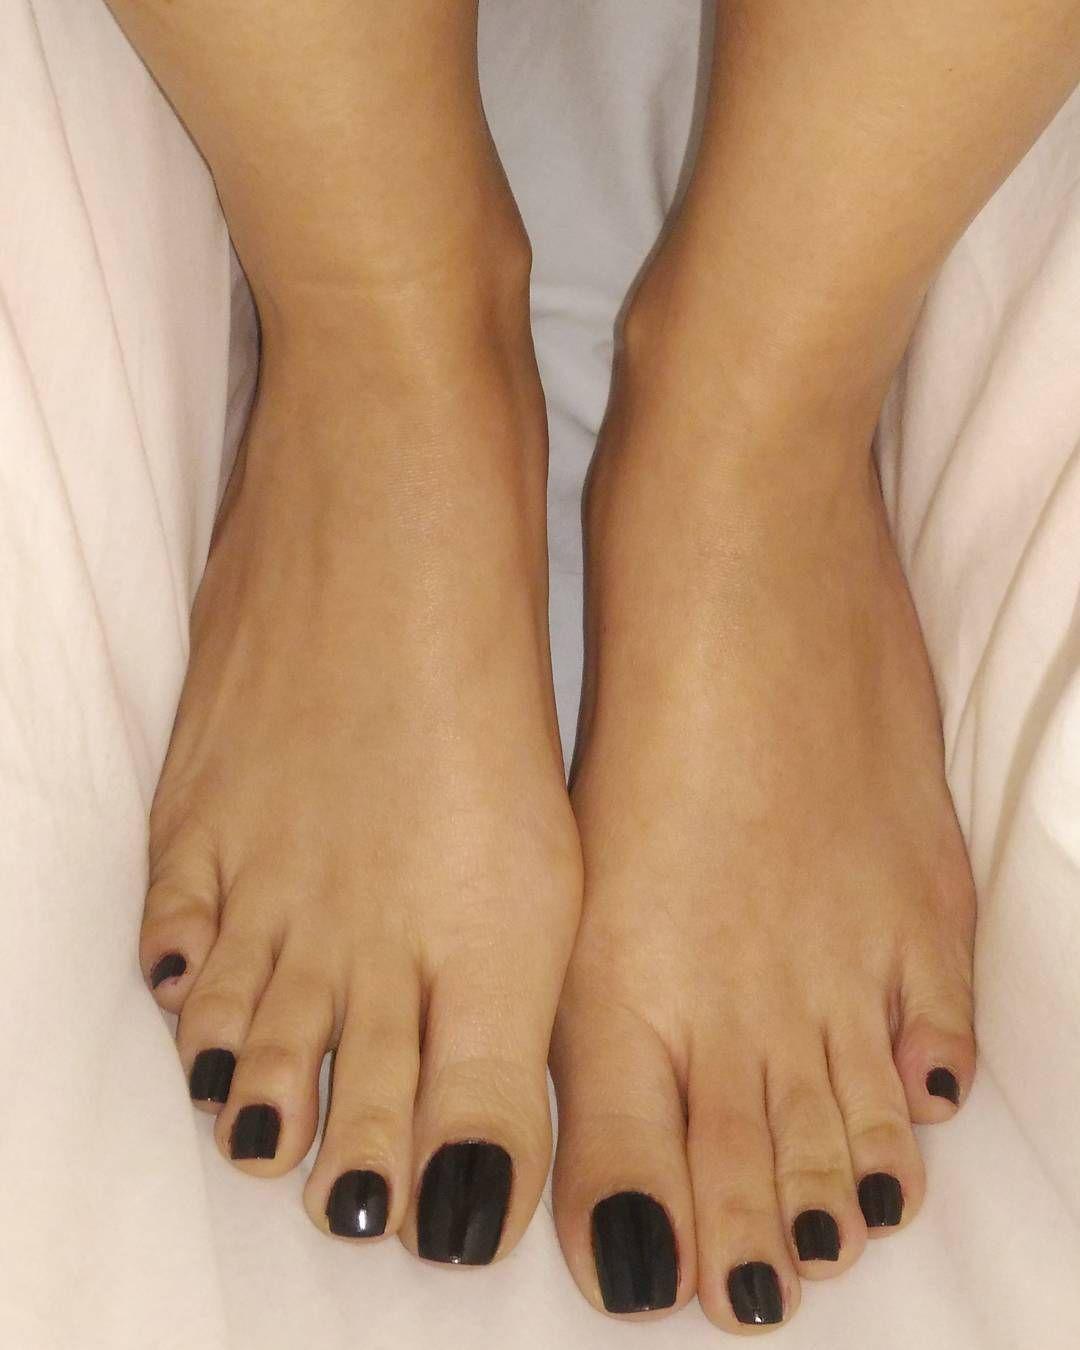 Pin By Sean Riggs On Pretty Feet